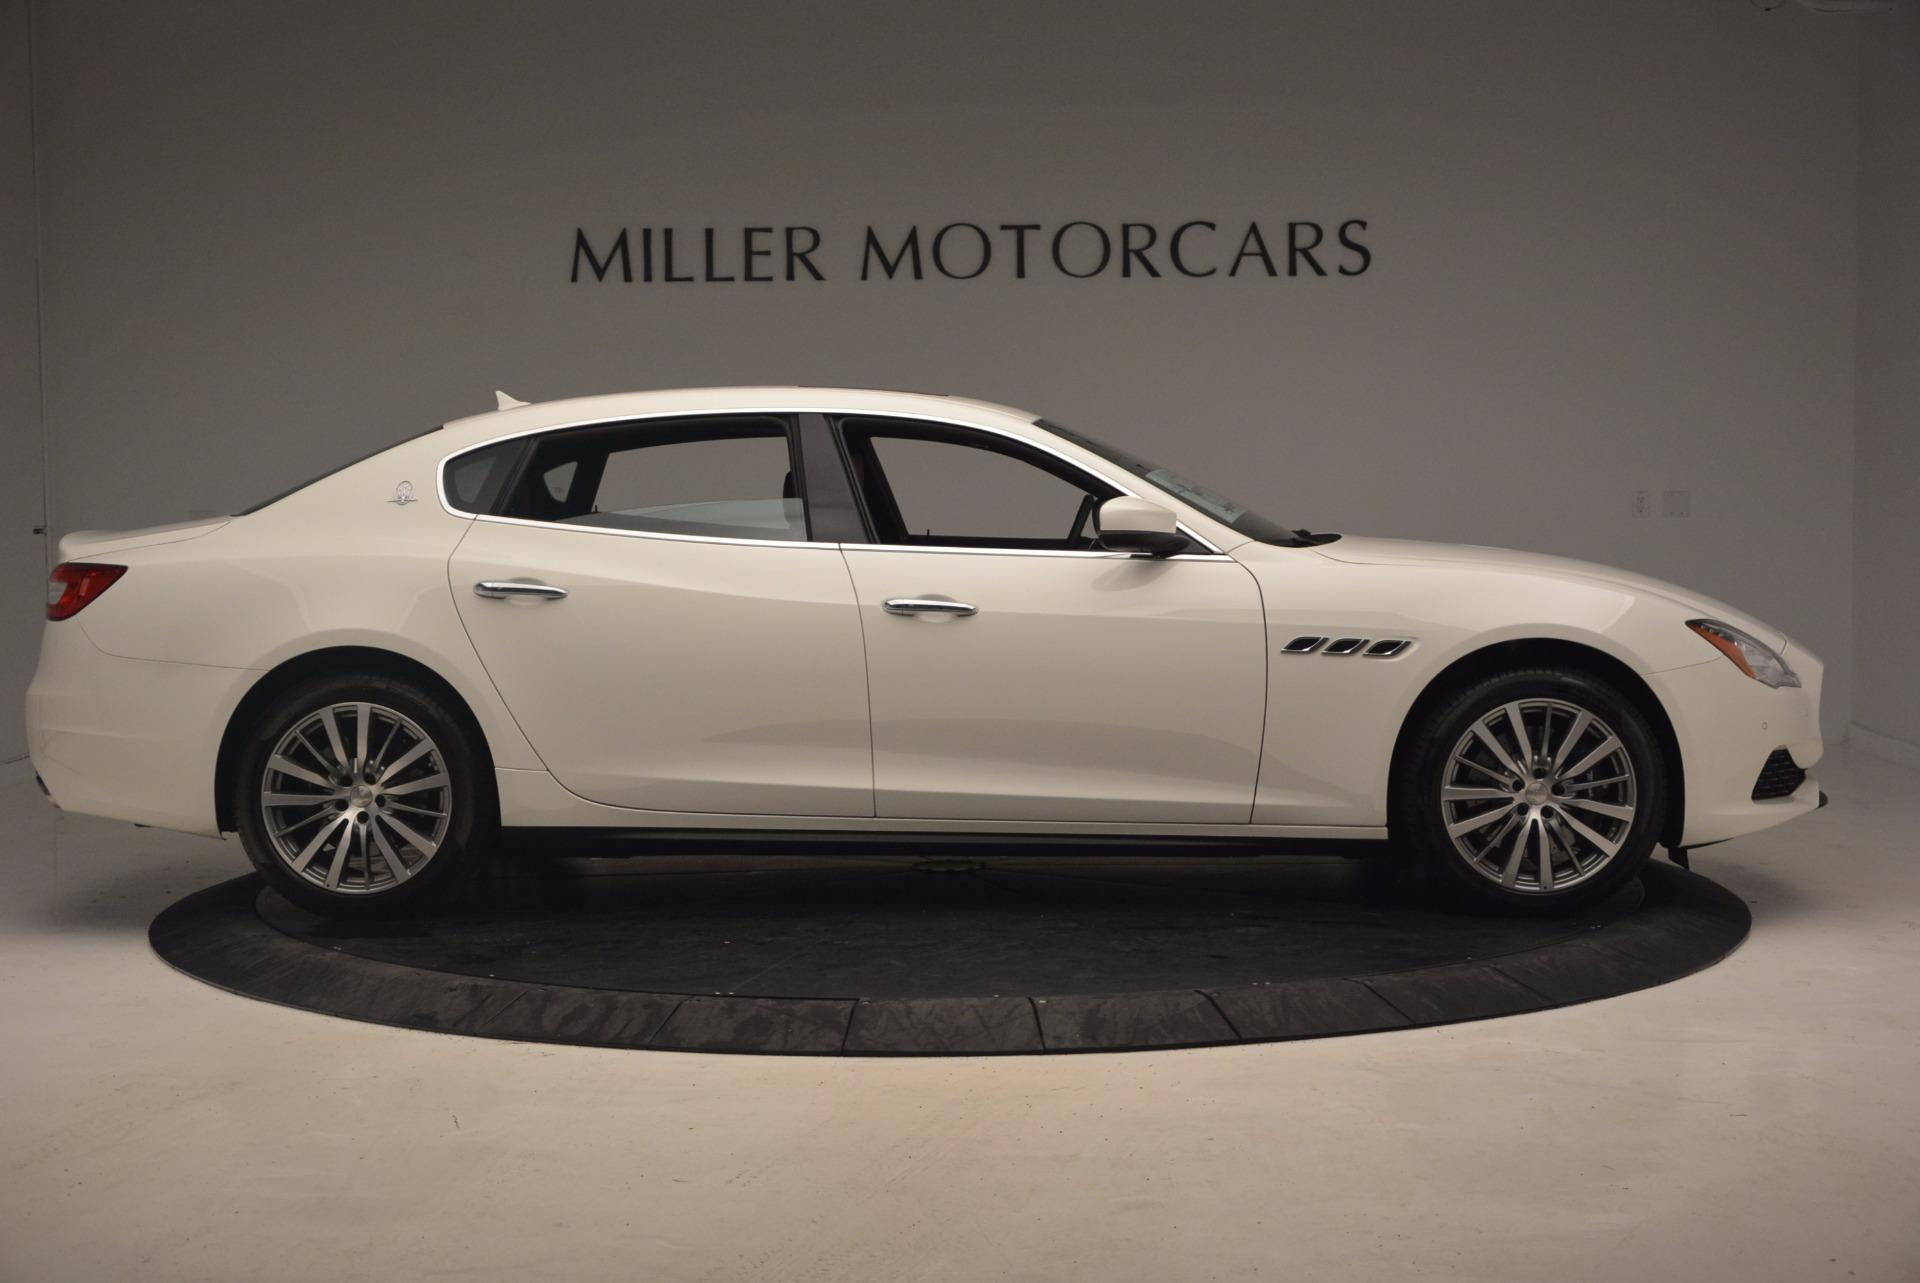 New 2017 Maserati Quattroporte SQ4 For Sale In Westport, CT 1065_p9